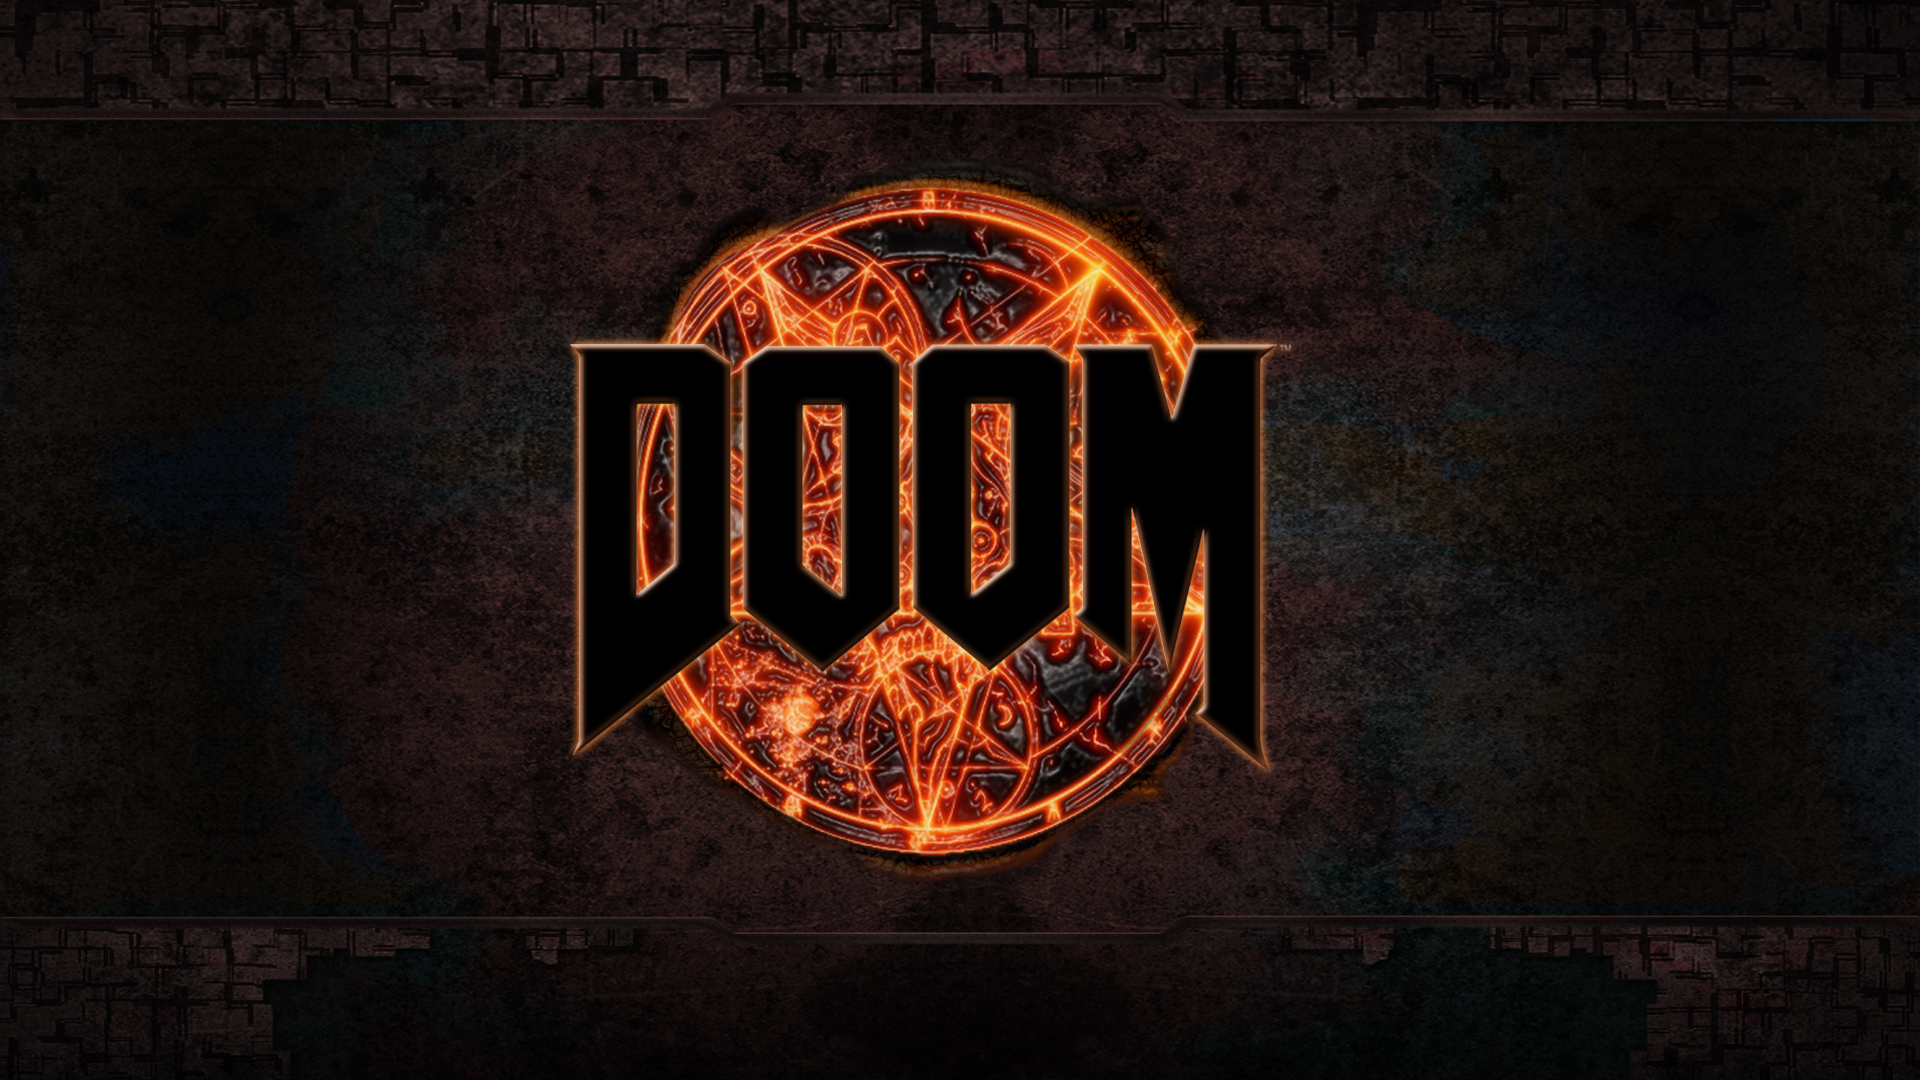 doom 3 wallpaper hd